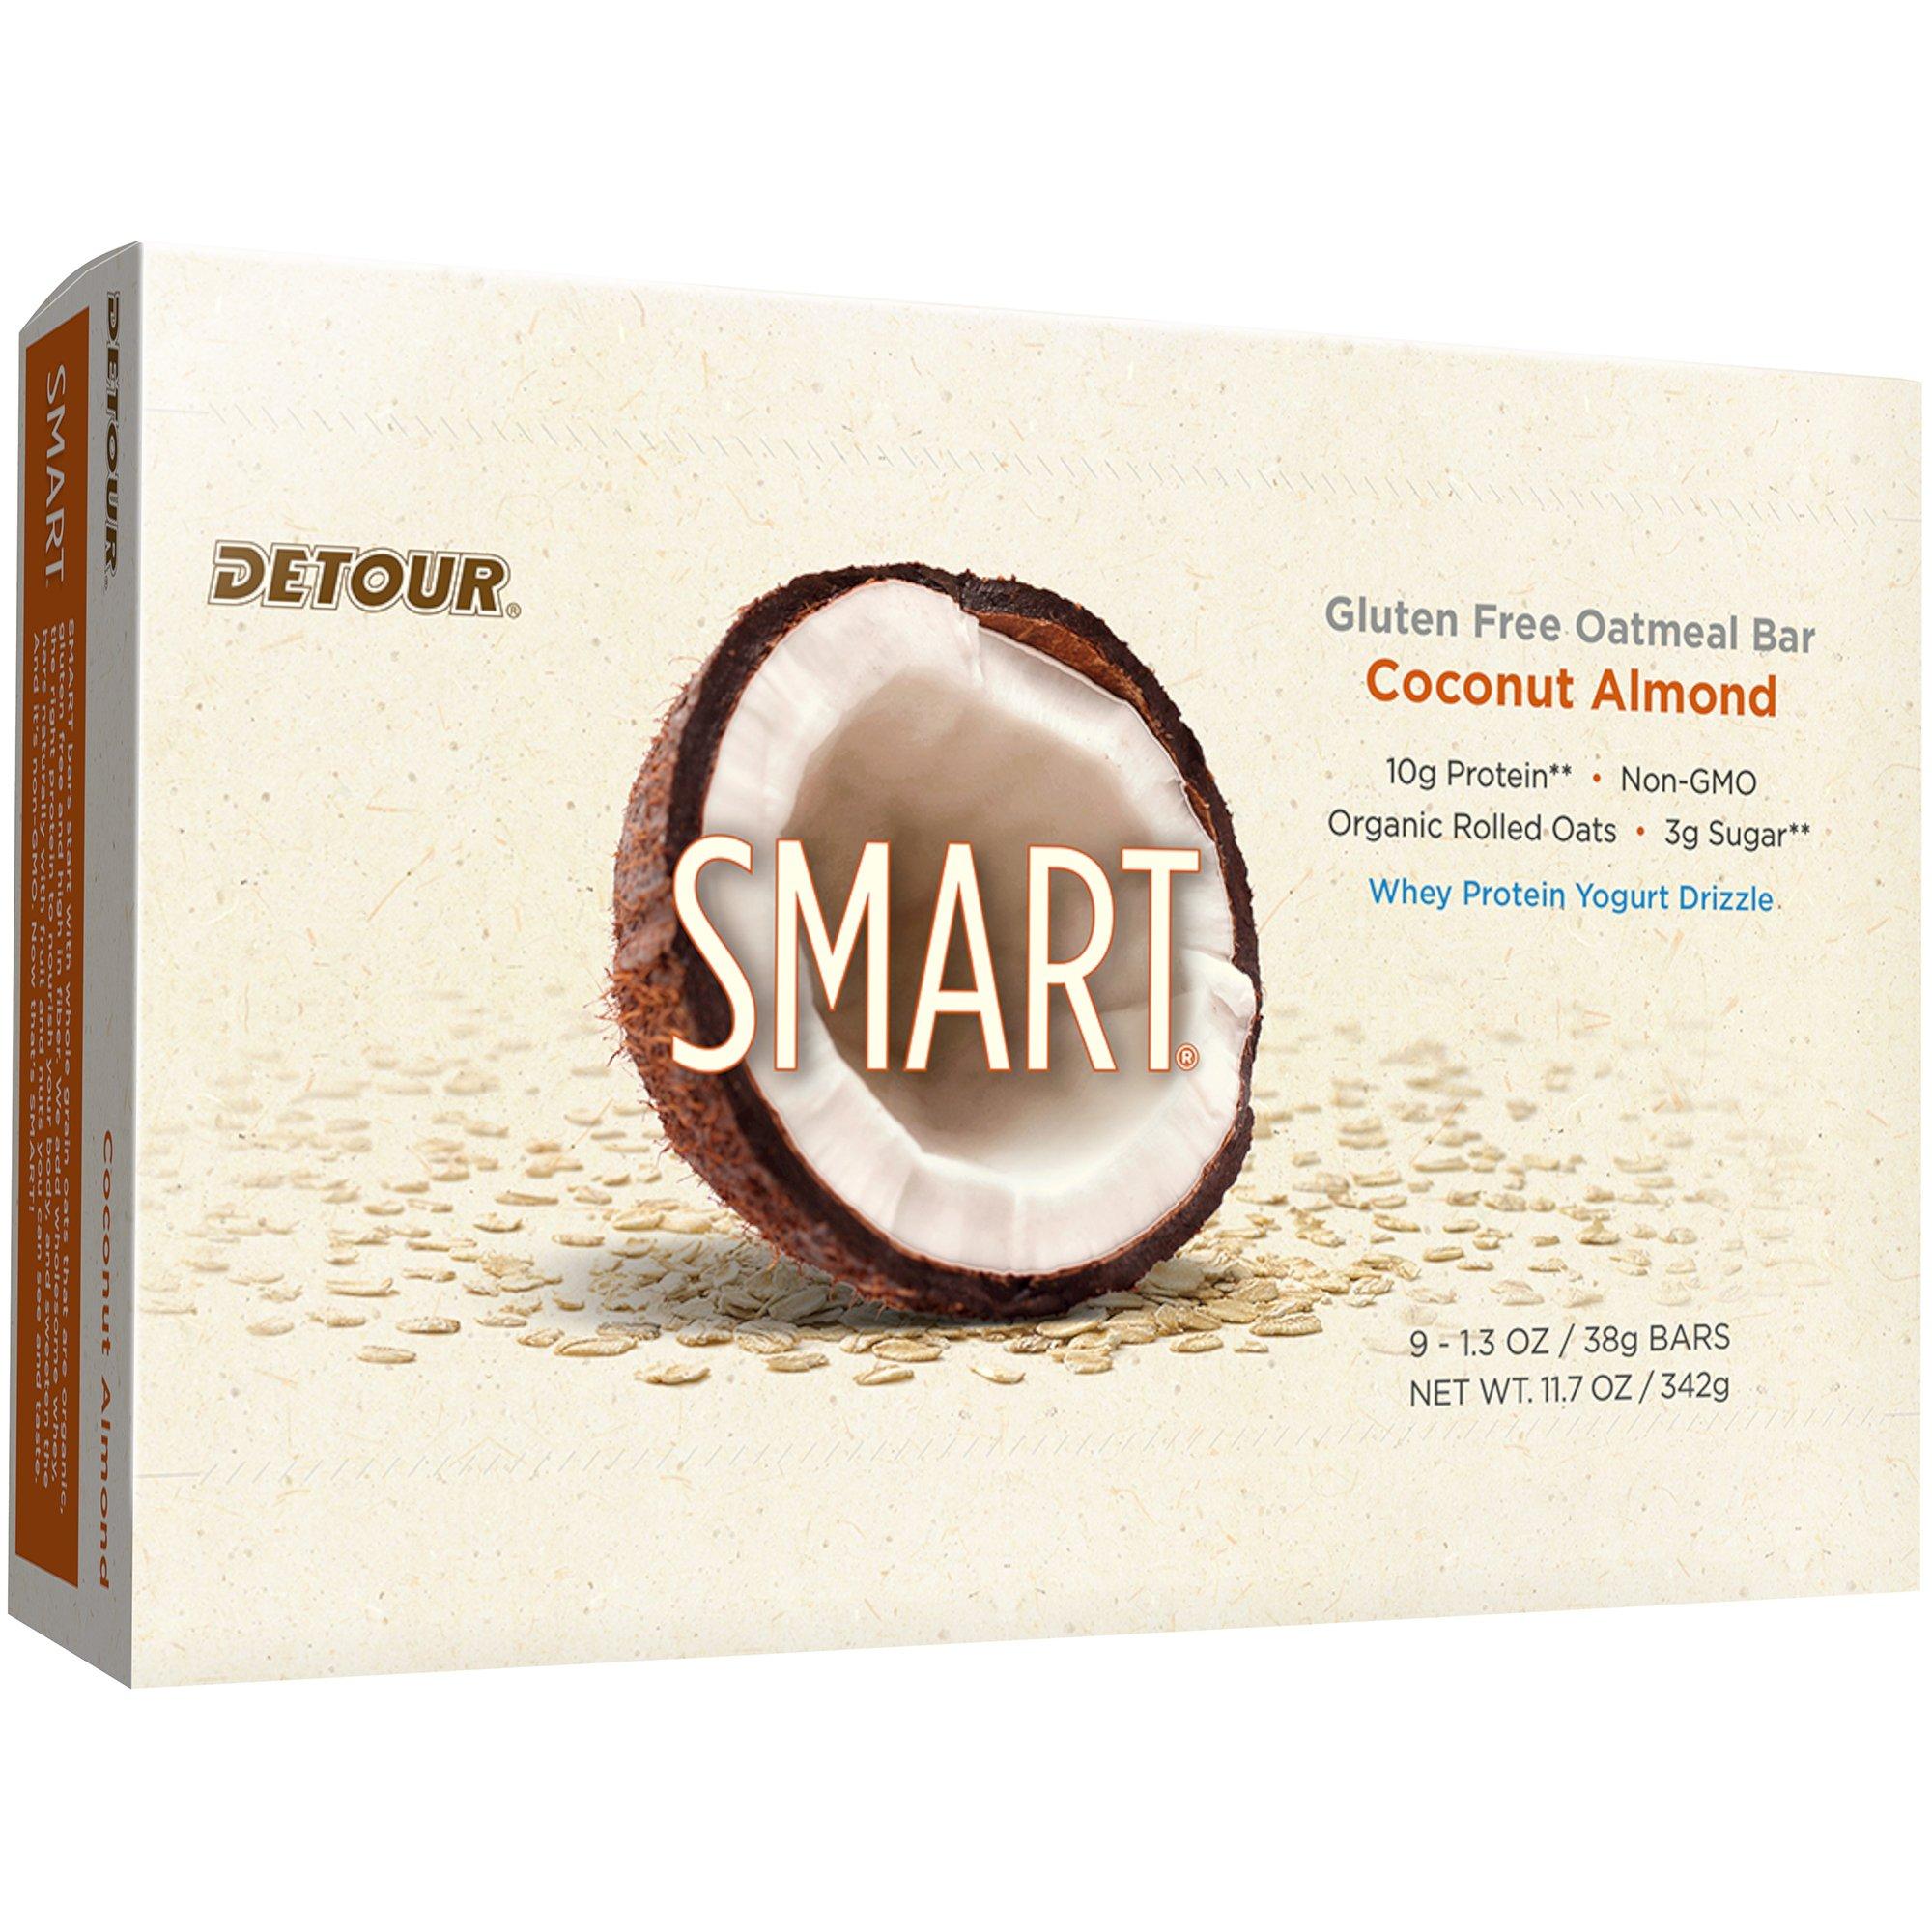 Detour Smart Gluten Free Oatmeal Bar, Coconut Almond, 11.7 Ounce, 9 count